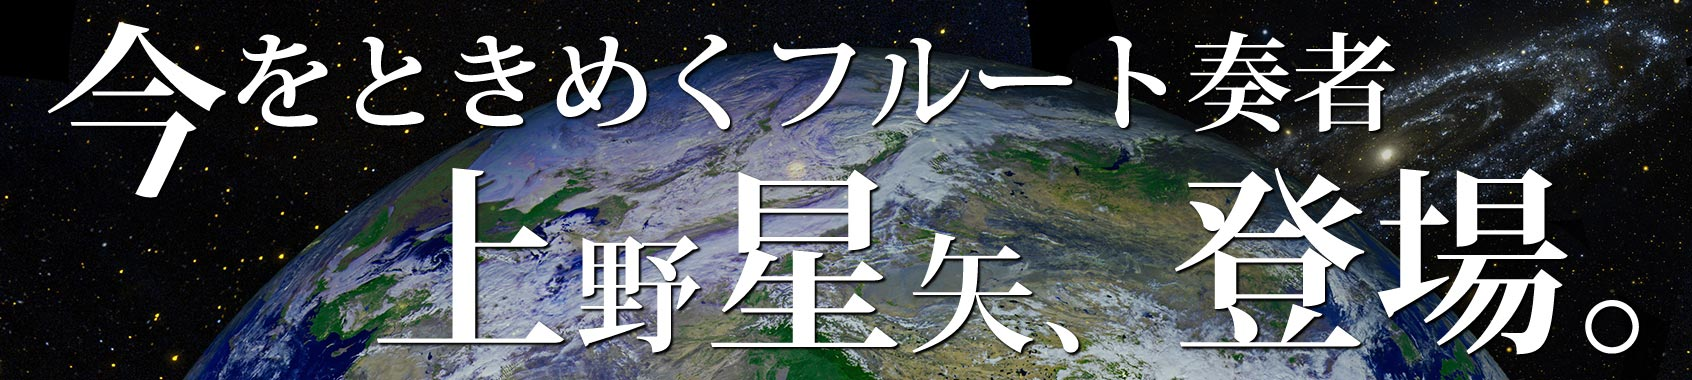 31st-R_UenoSeiya_earth